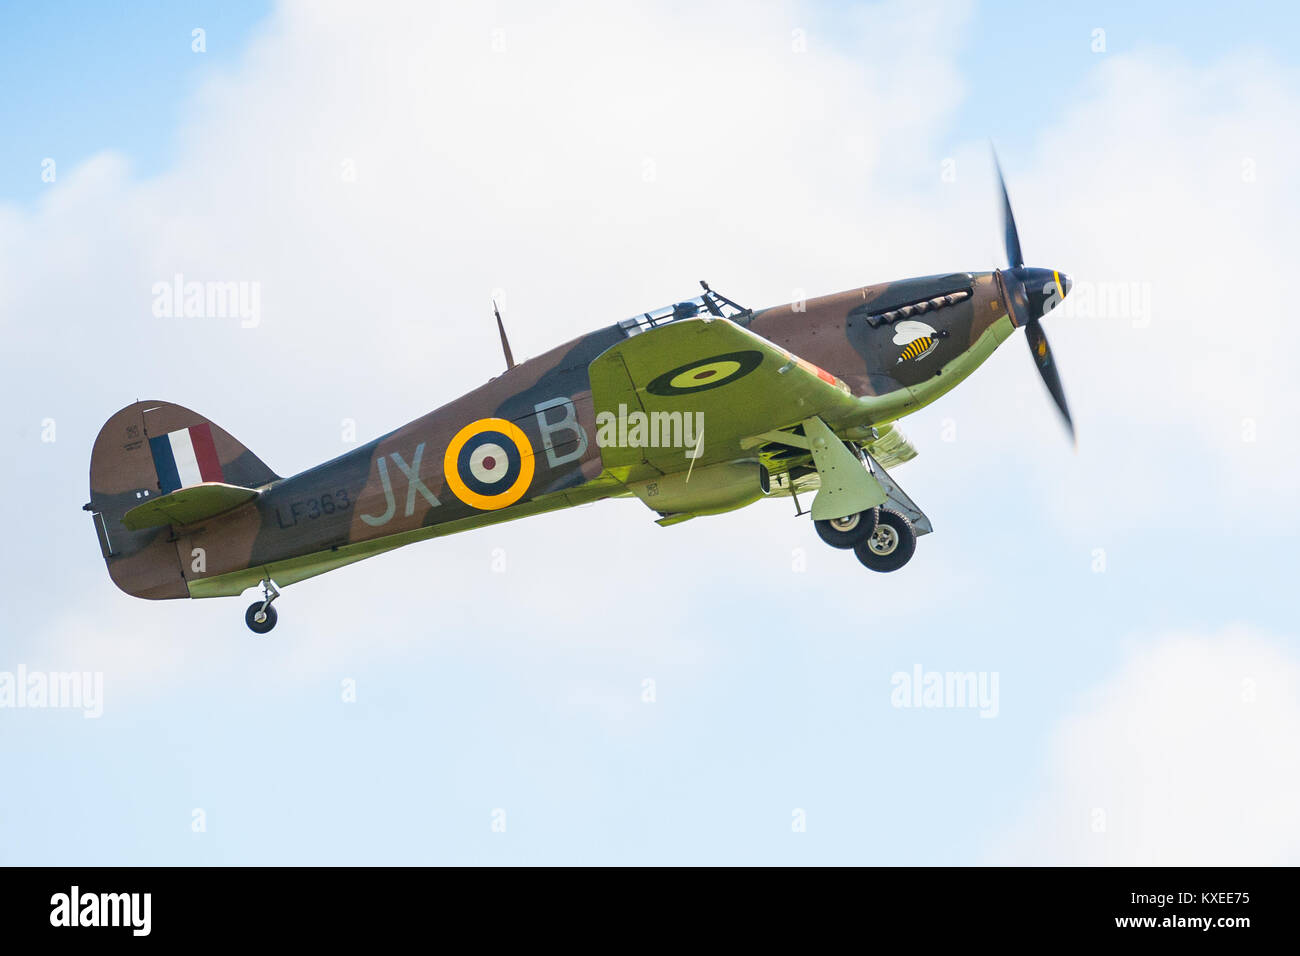 Hurricane LF363 (Mk IIc) Battle of Britain 75th anniversary at Goodwood (RAF Westhampnett) - Stock Image